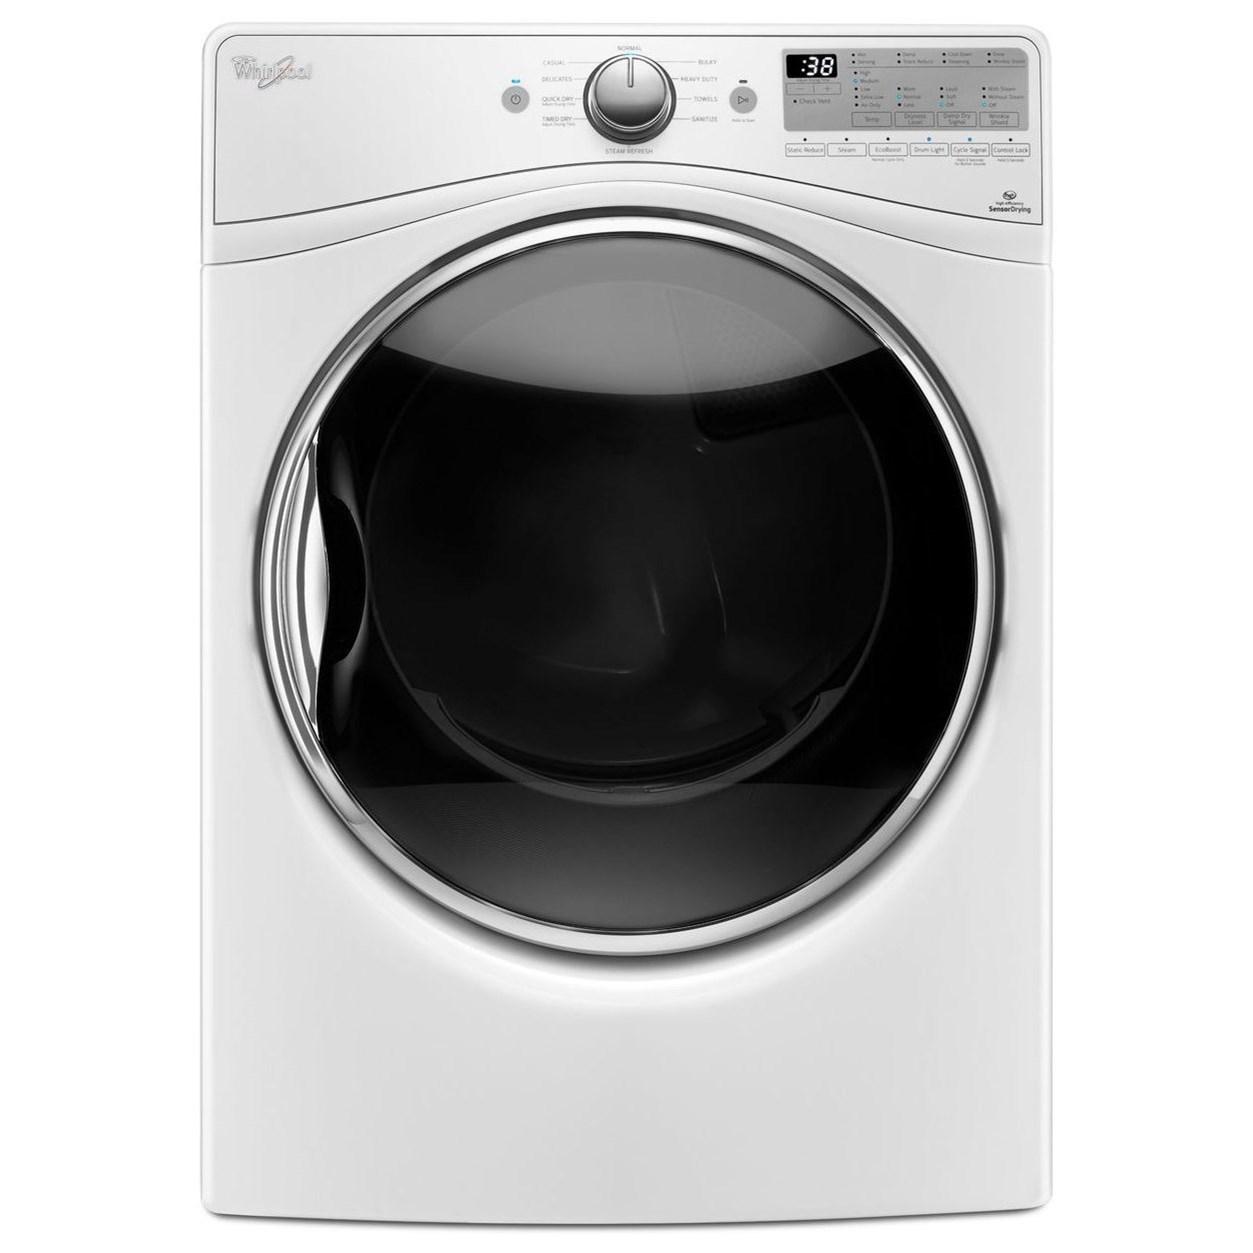 Whirlpool Gas Dryers 7.4 cu. ft. Gas Dryer - Item Number: WGD92HEFW